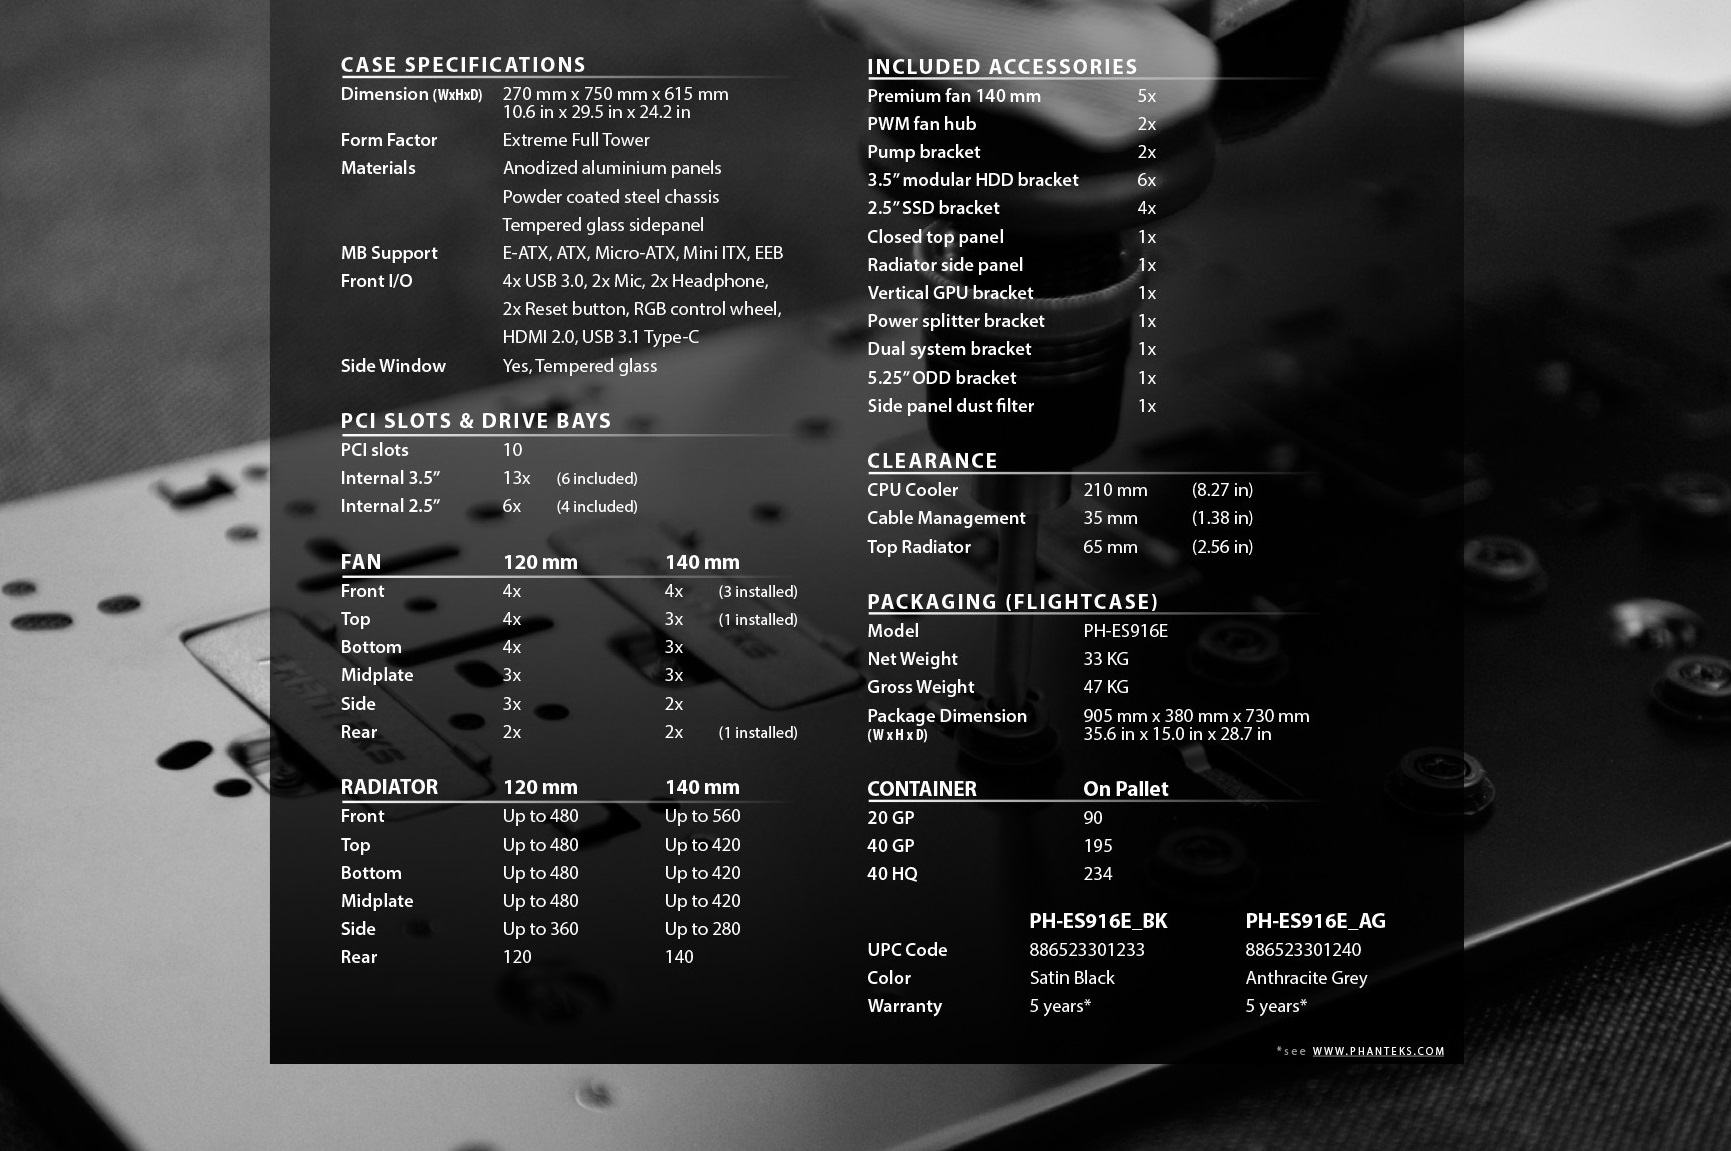 Phanteks Enthoo Elite Extreme RGB Lighting, Tempered Glass Window, Dual System Support thông số kĩ thuật